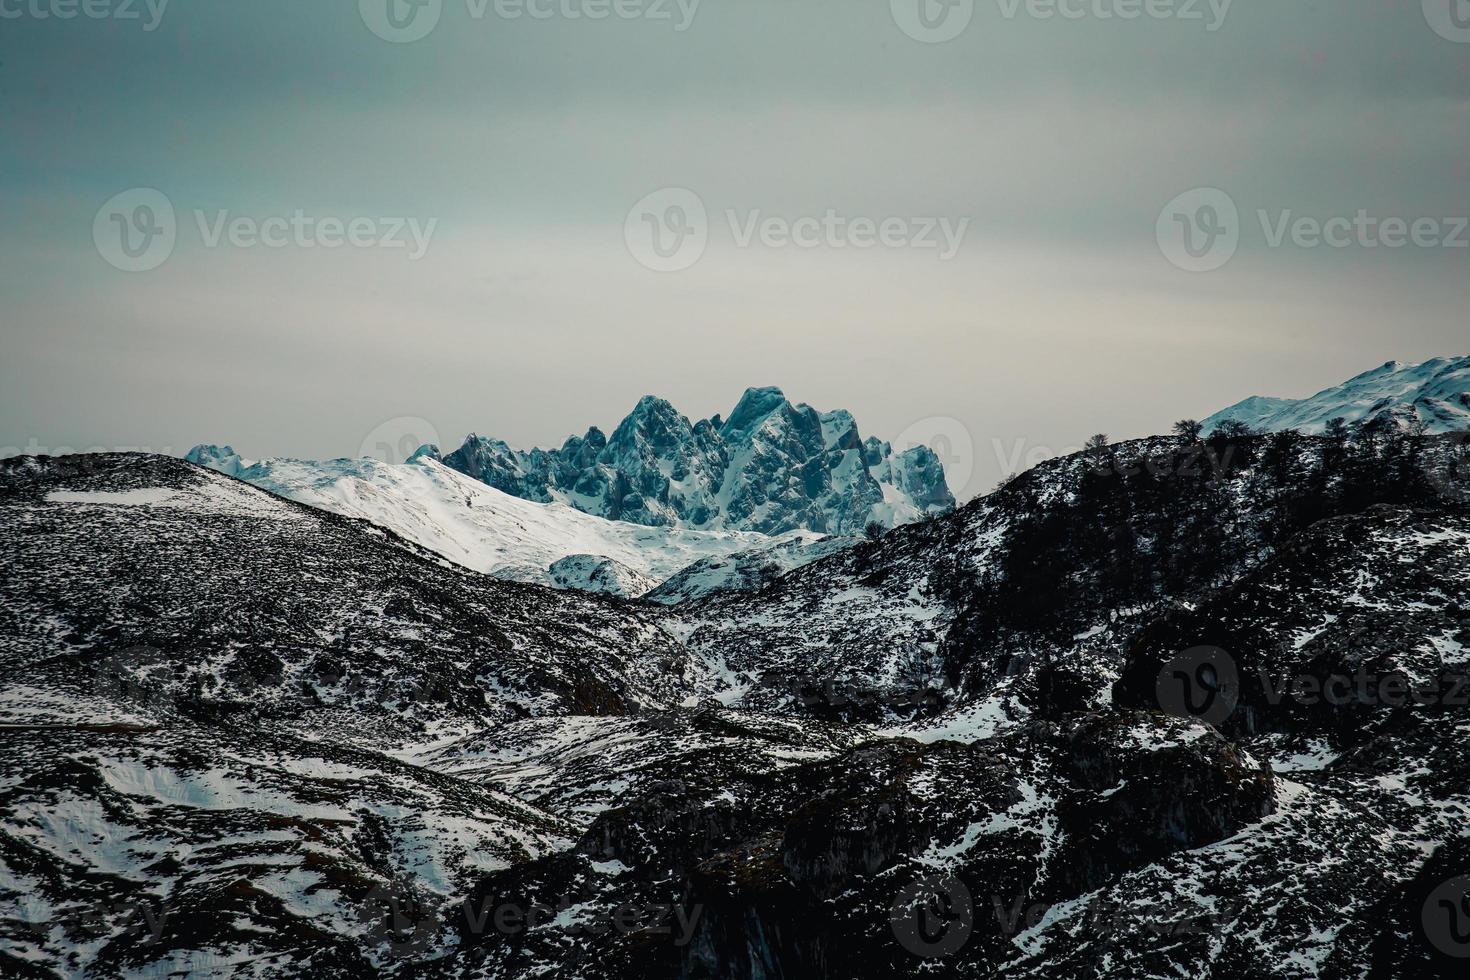 Massive and risky peak in the mountain photo